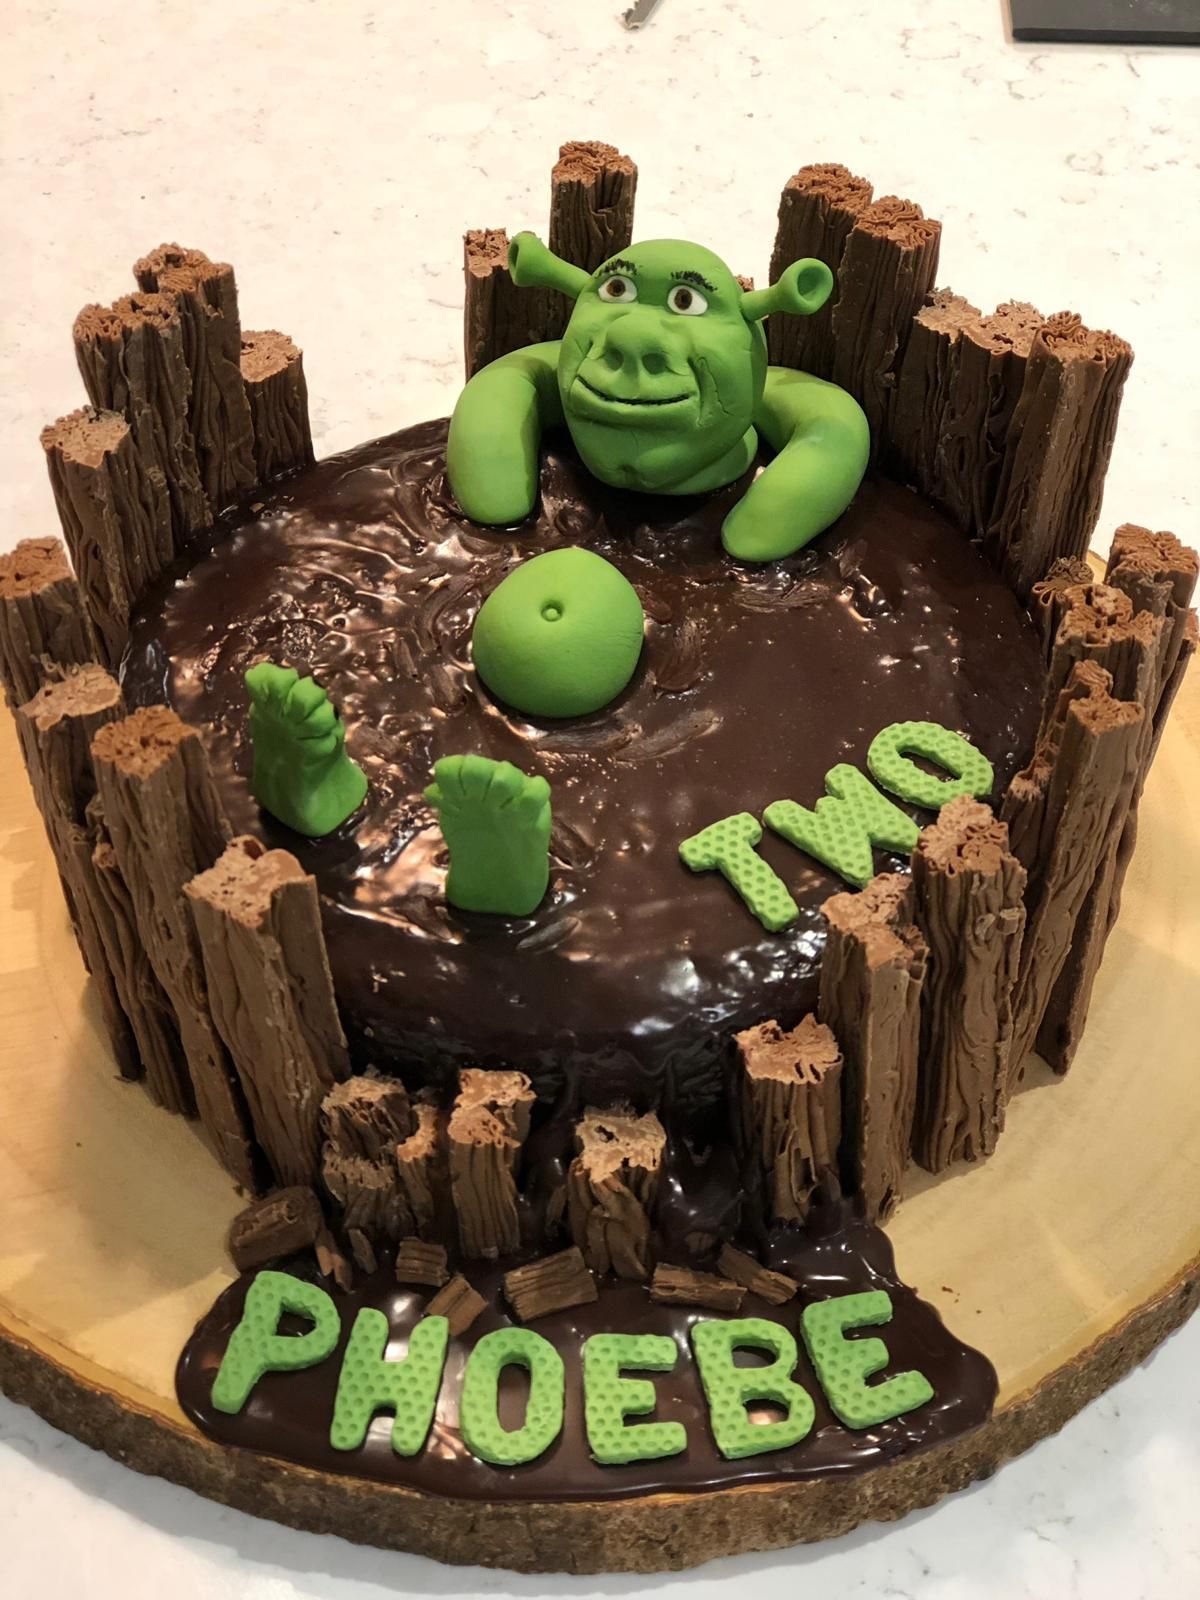 Awesome Shrek Cake Two Year Old Birthday Cake With Images Shrek Cake Funny Birthday Cards Online Elaedamsfinfo